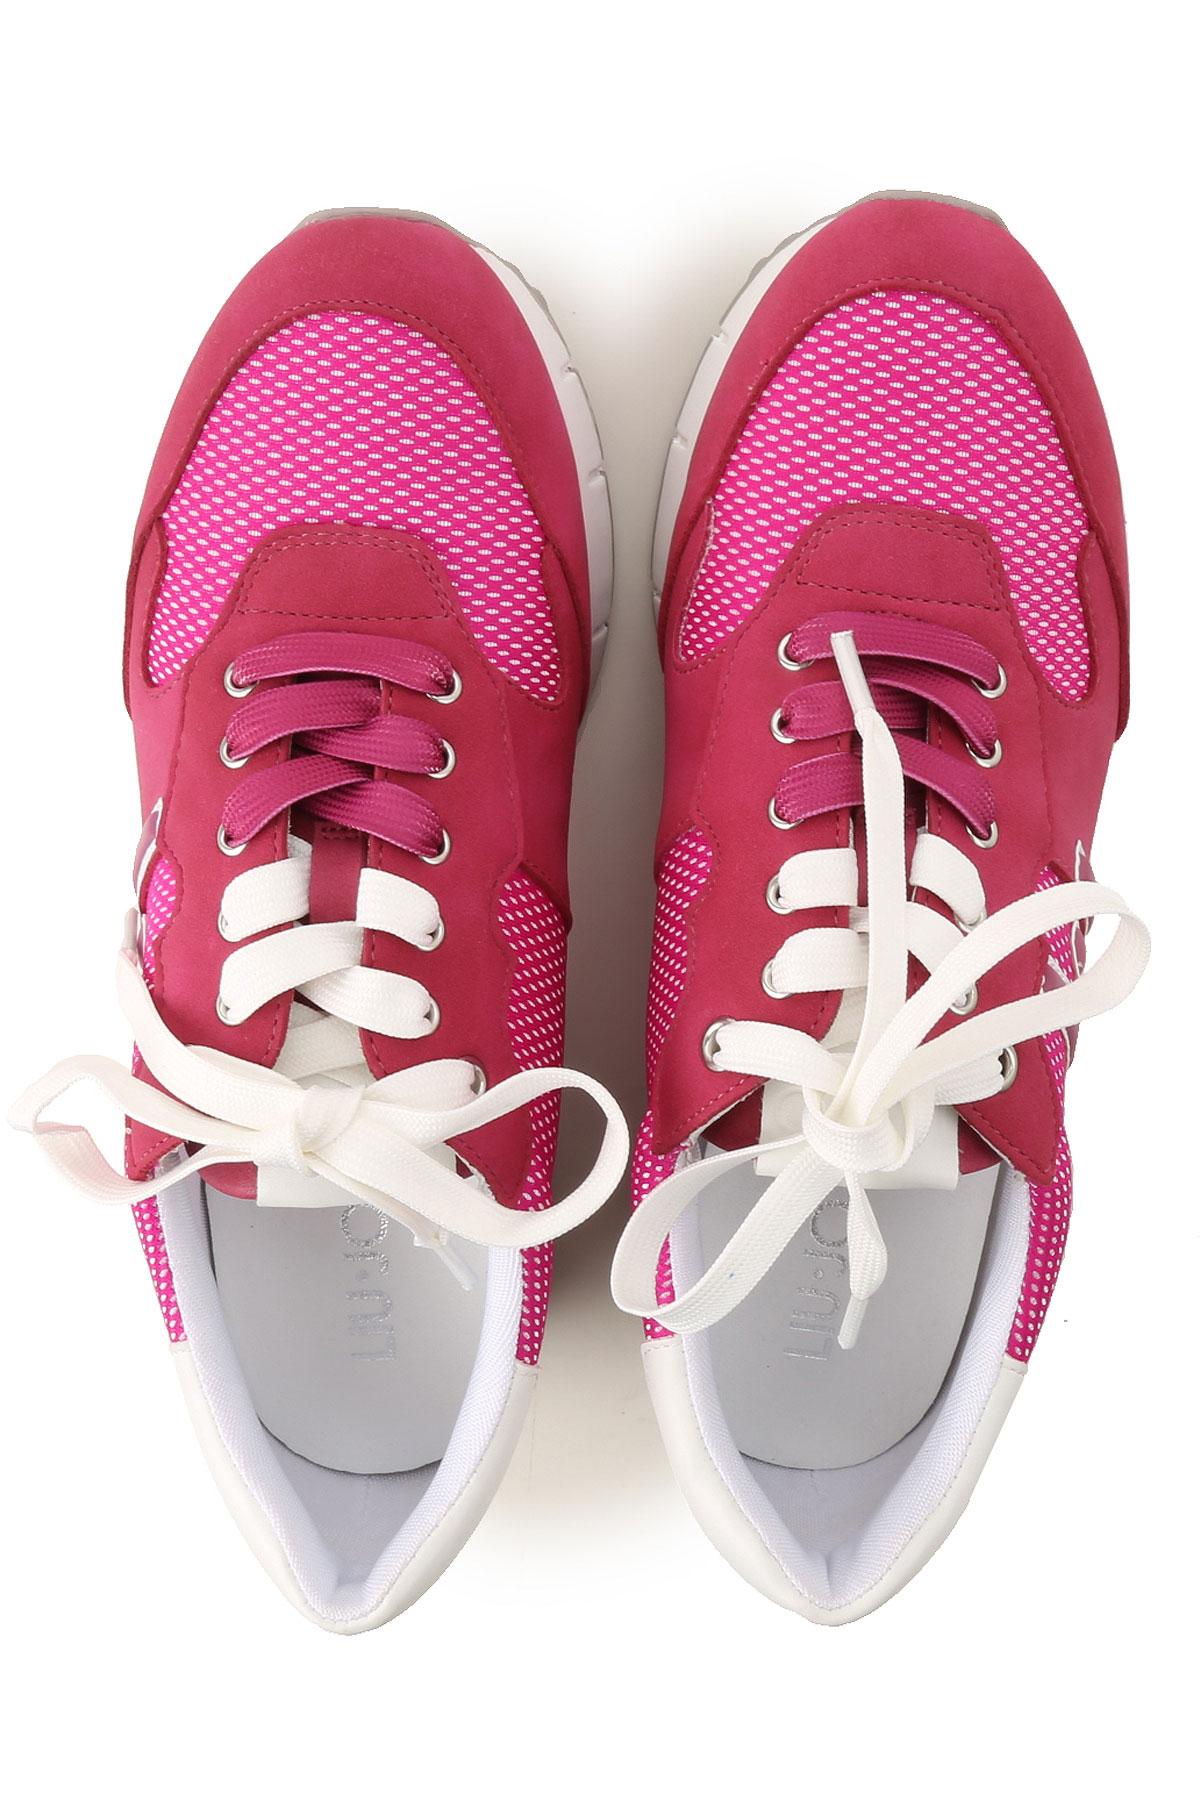 Liu Zapatos Geraneo Rosa Jo Para 2019 Blanco Primavera verano Mujer Fluorescente wwqSHaB